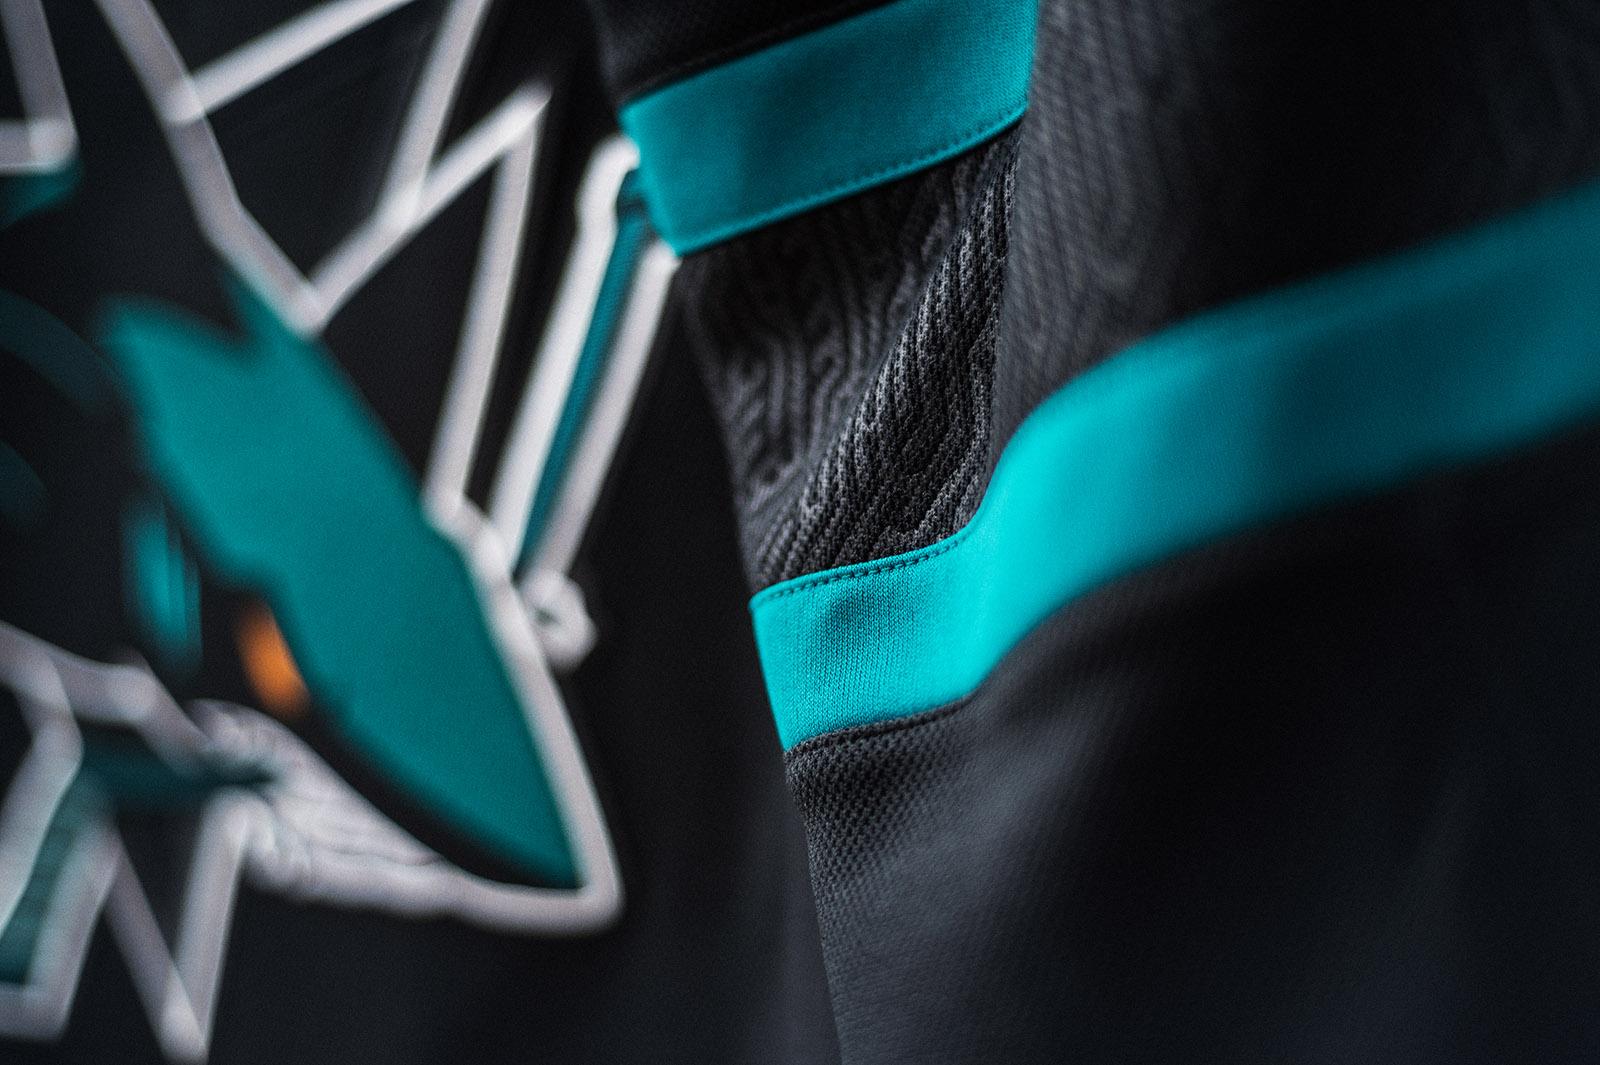 adidasHockey x Sharks 3rd Jersey_009.jpg